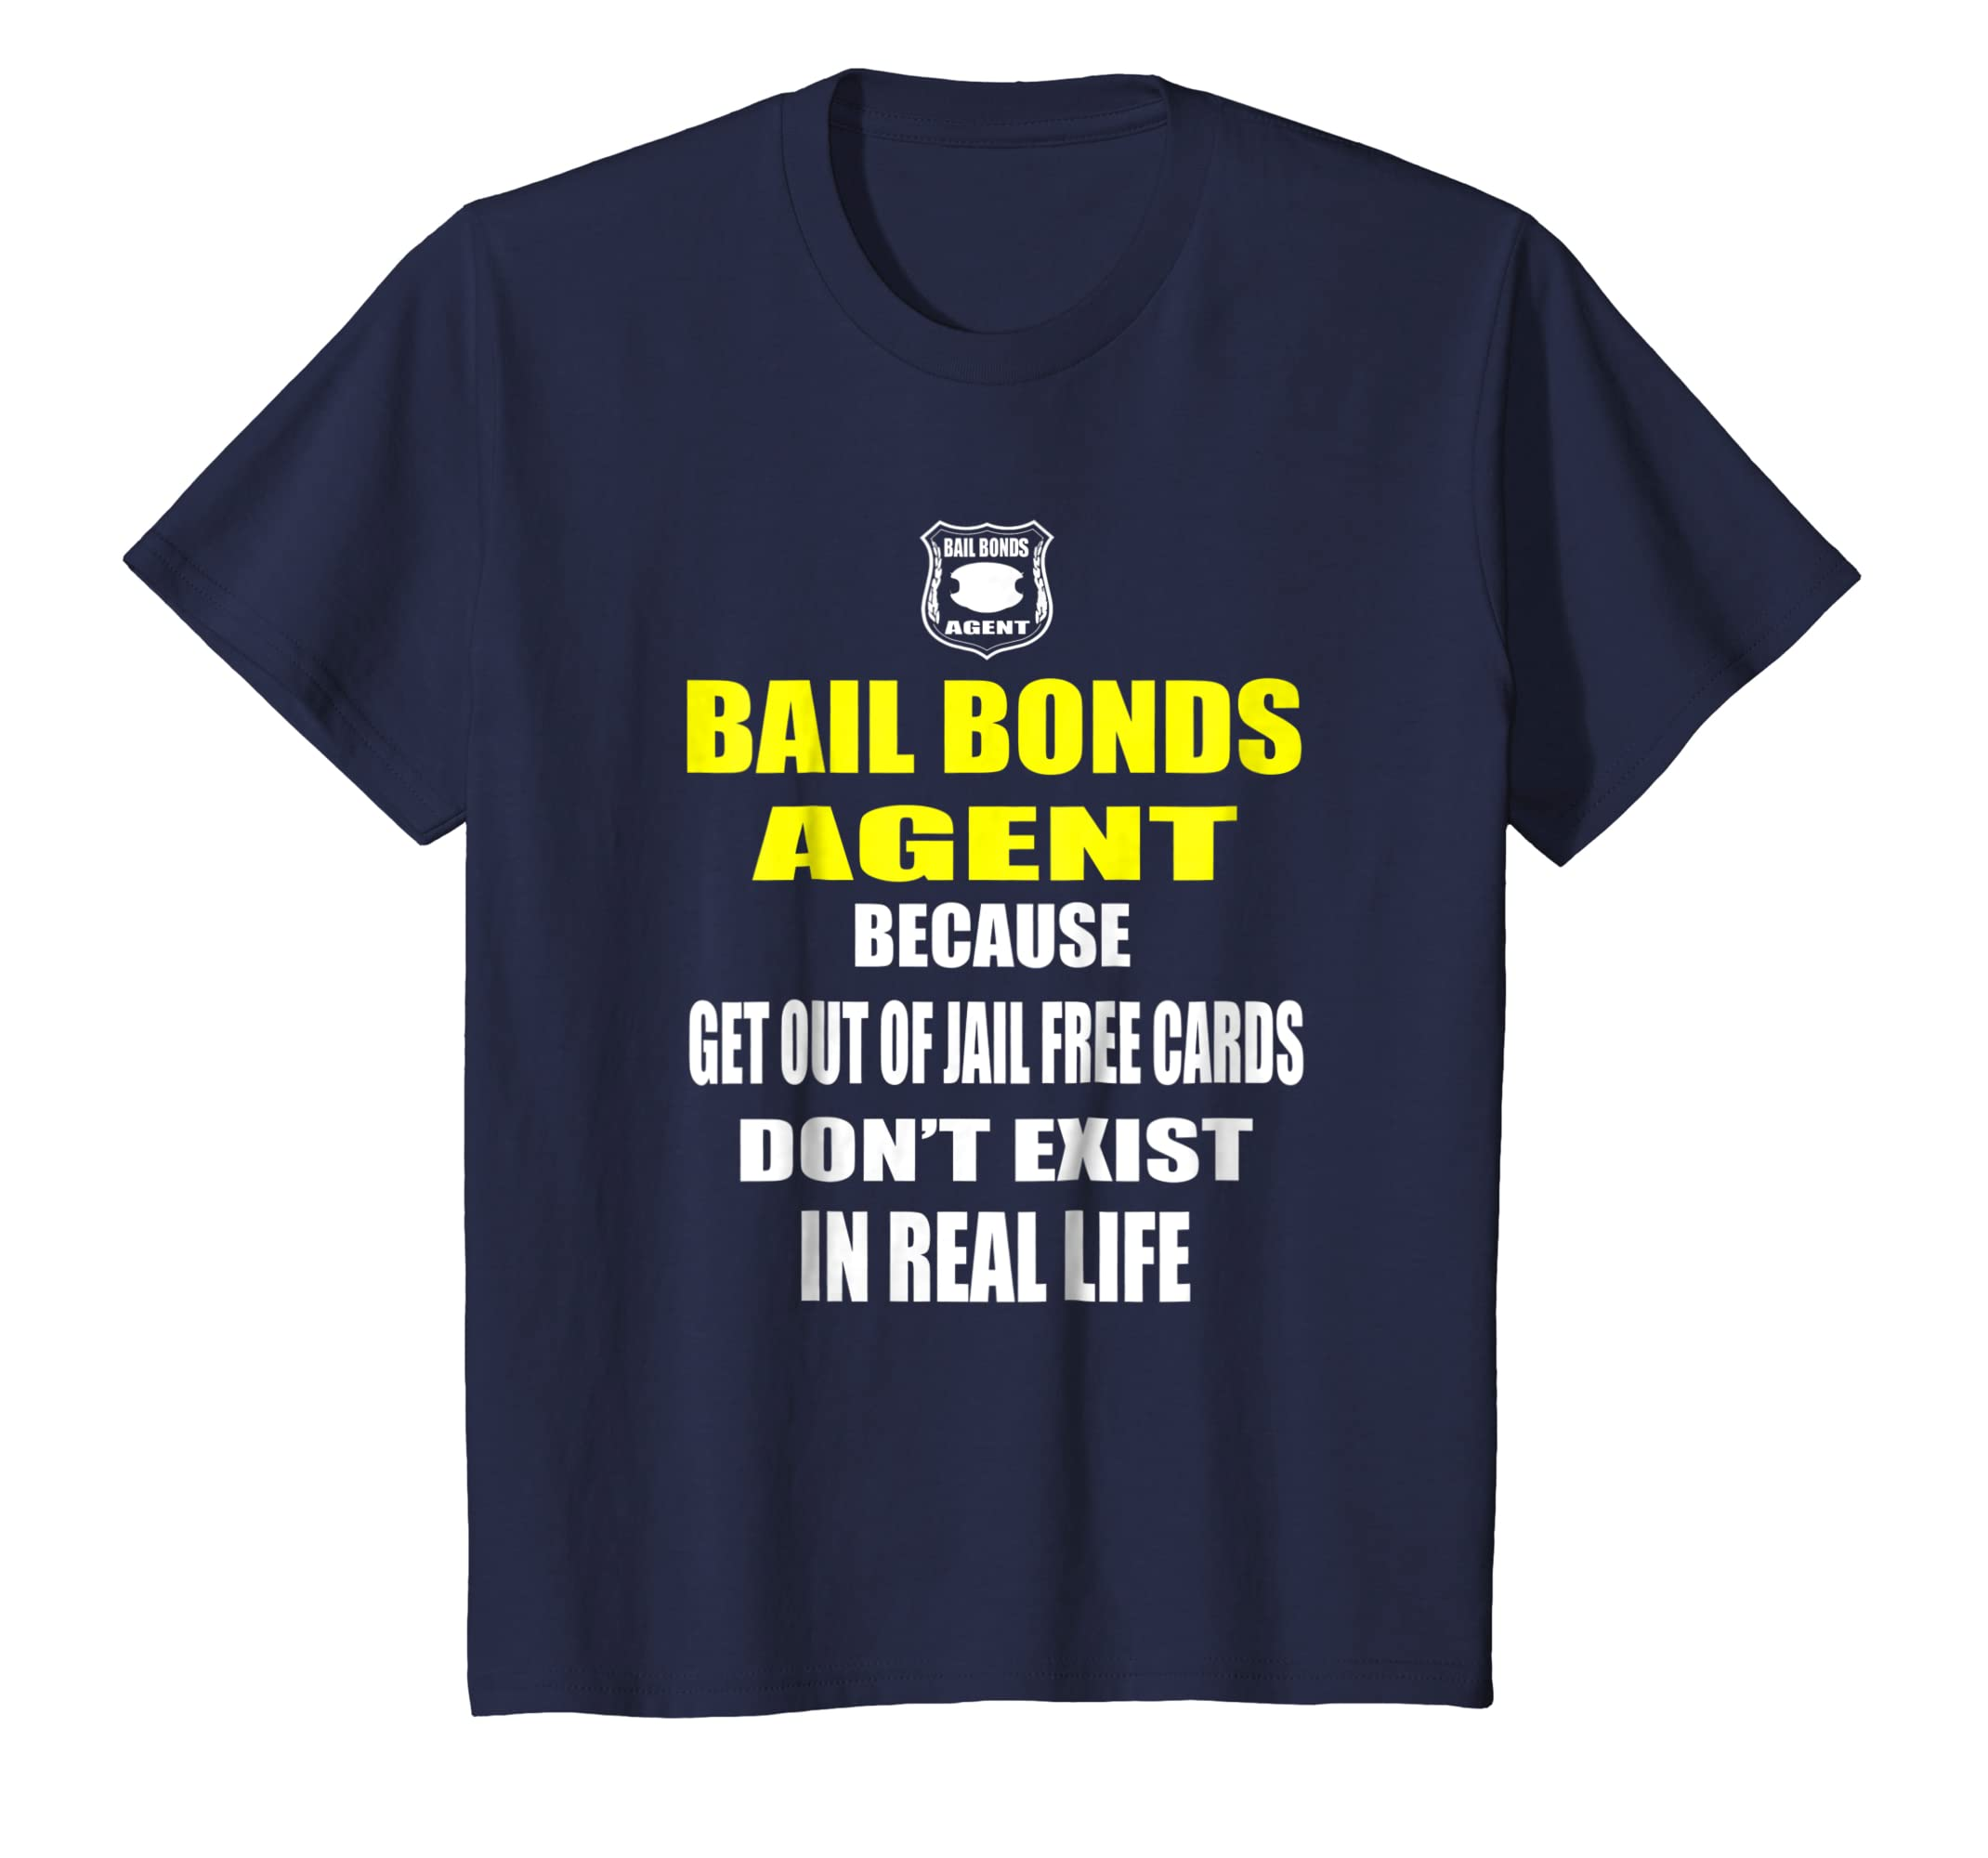 bail agent - Cablo.commongroundsapex.co